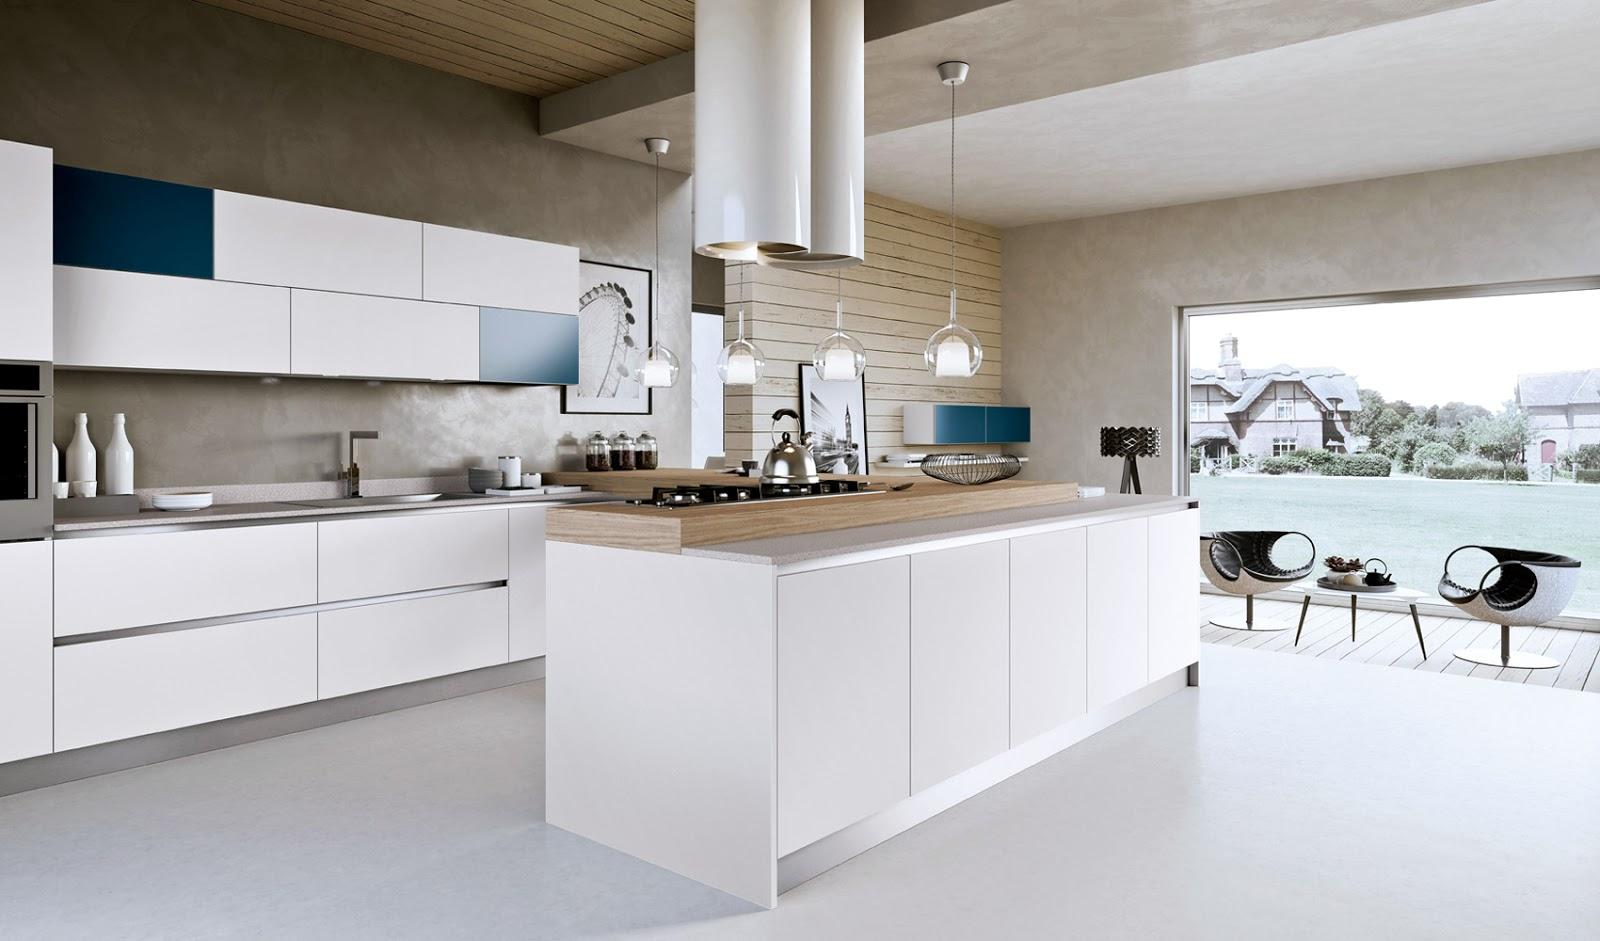 Nowoczesna kuchnia z oknem bajkowe wn trza for Cocinas modernas outlet